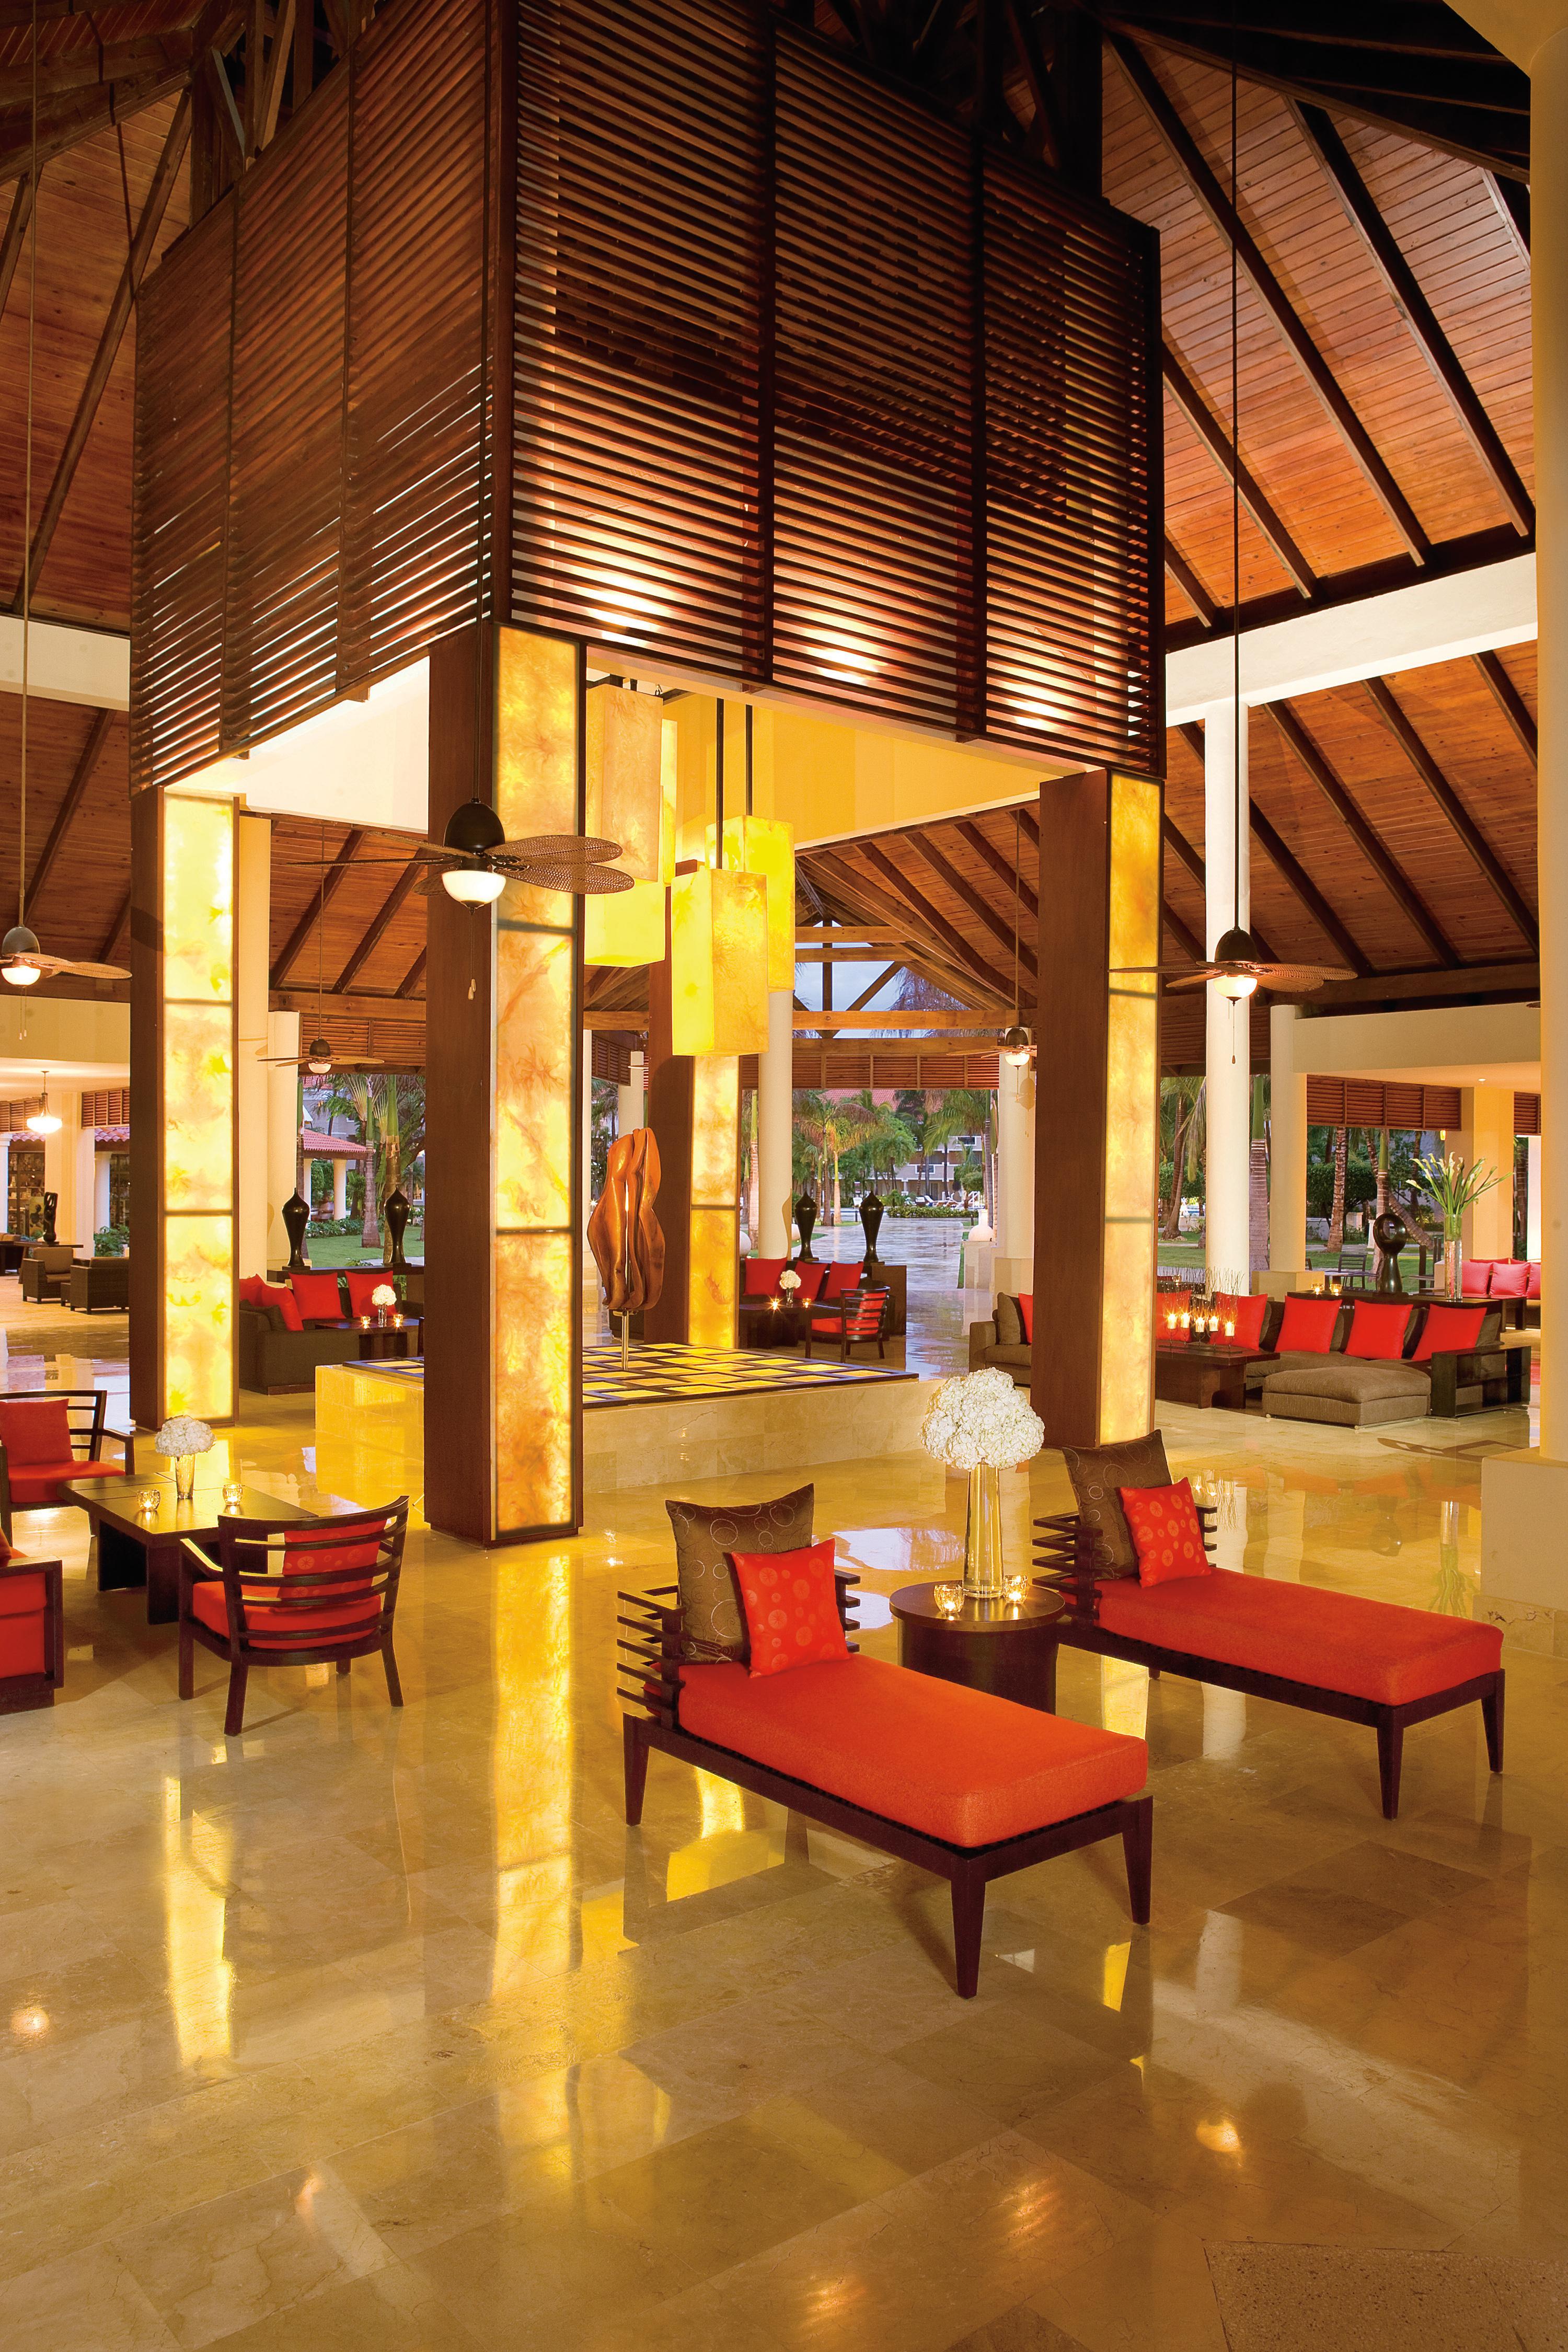 Travel Agency All-Inclusive Resort Dreams Palm Beach 09